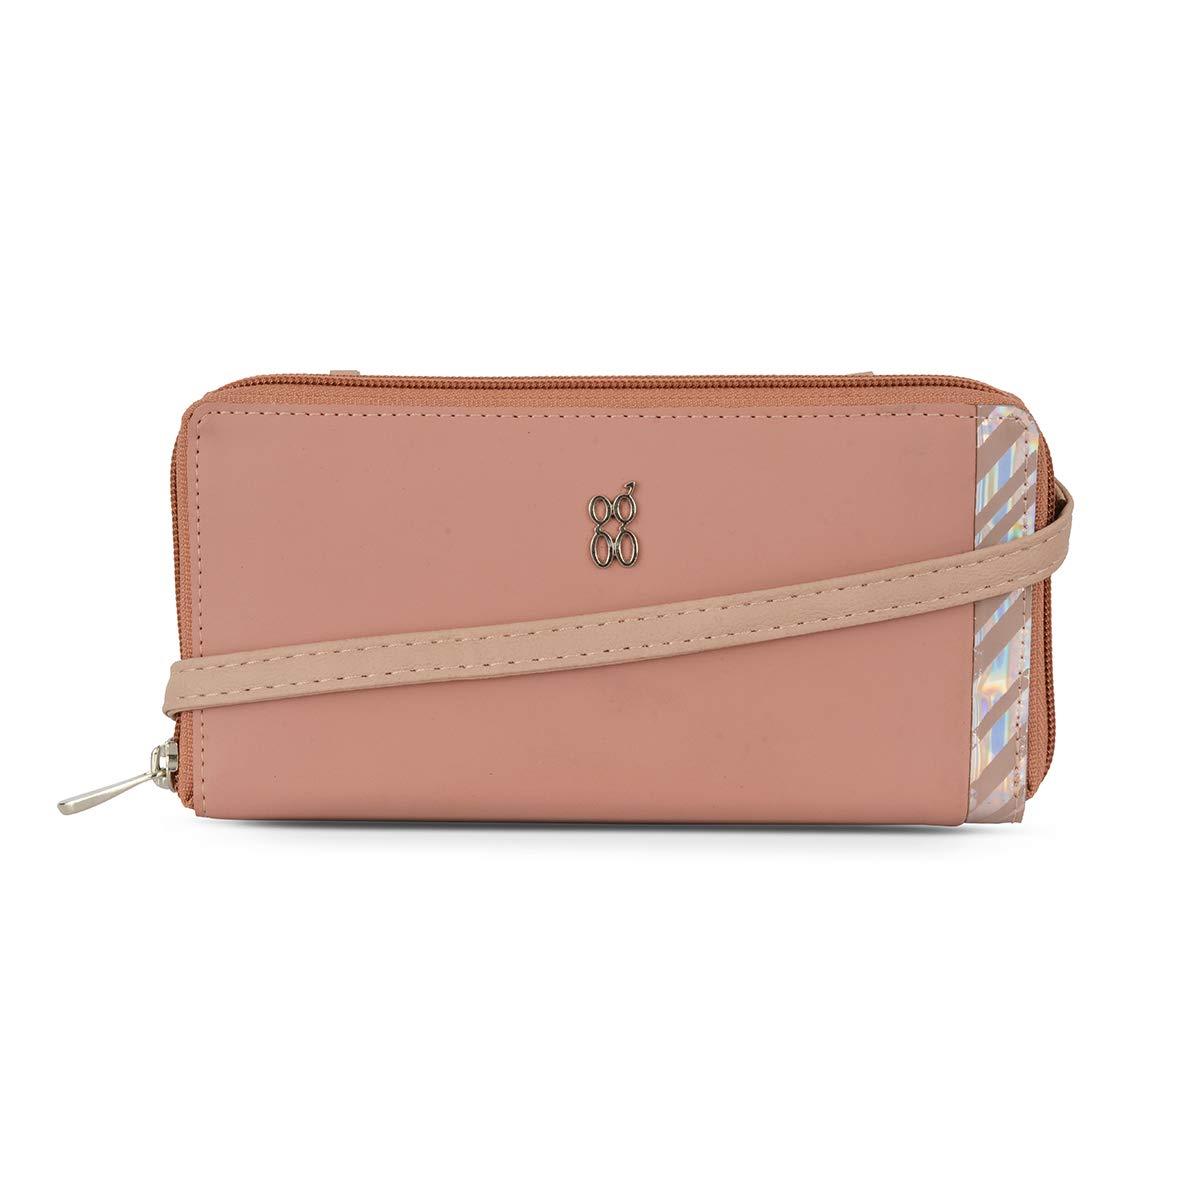 Baggit Spring-Summer 2020 Faux Leather Women's Ziparound Wallet